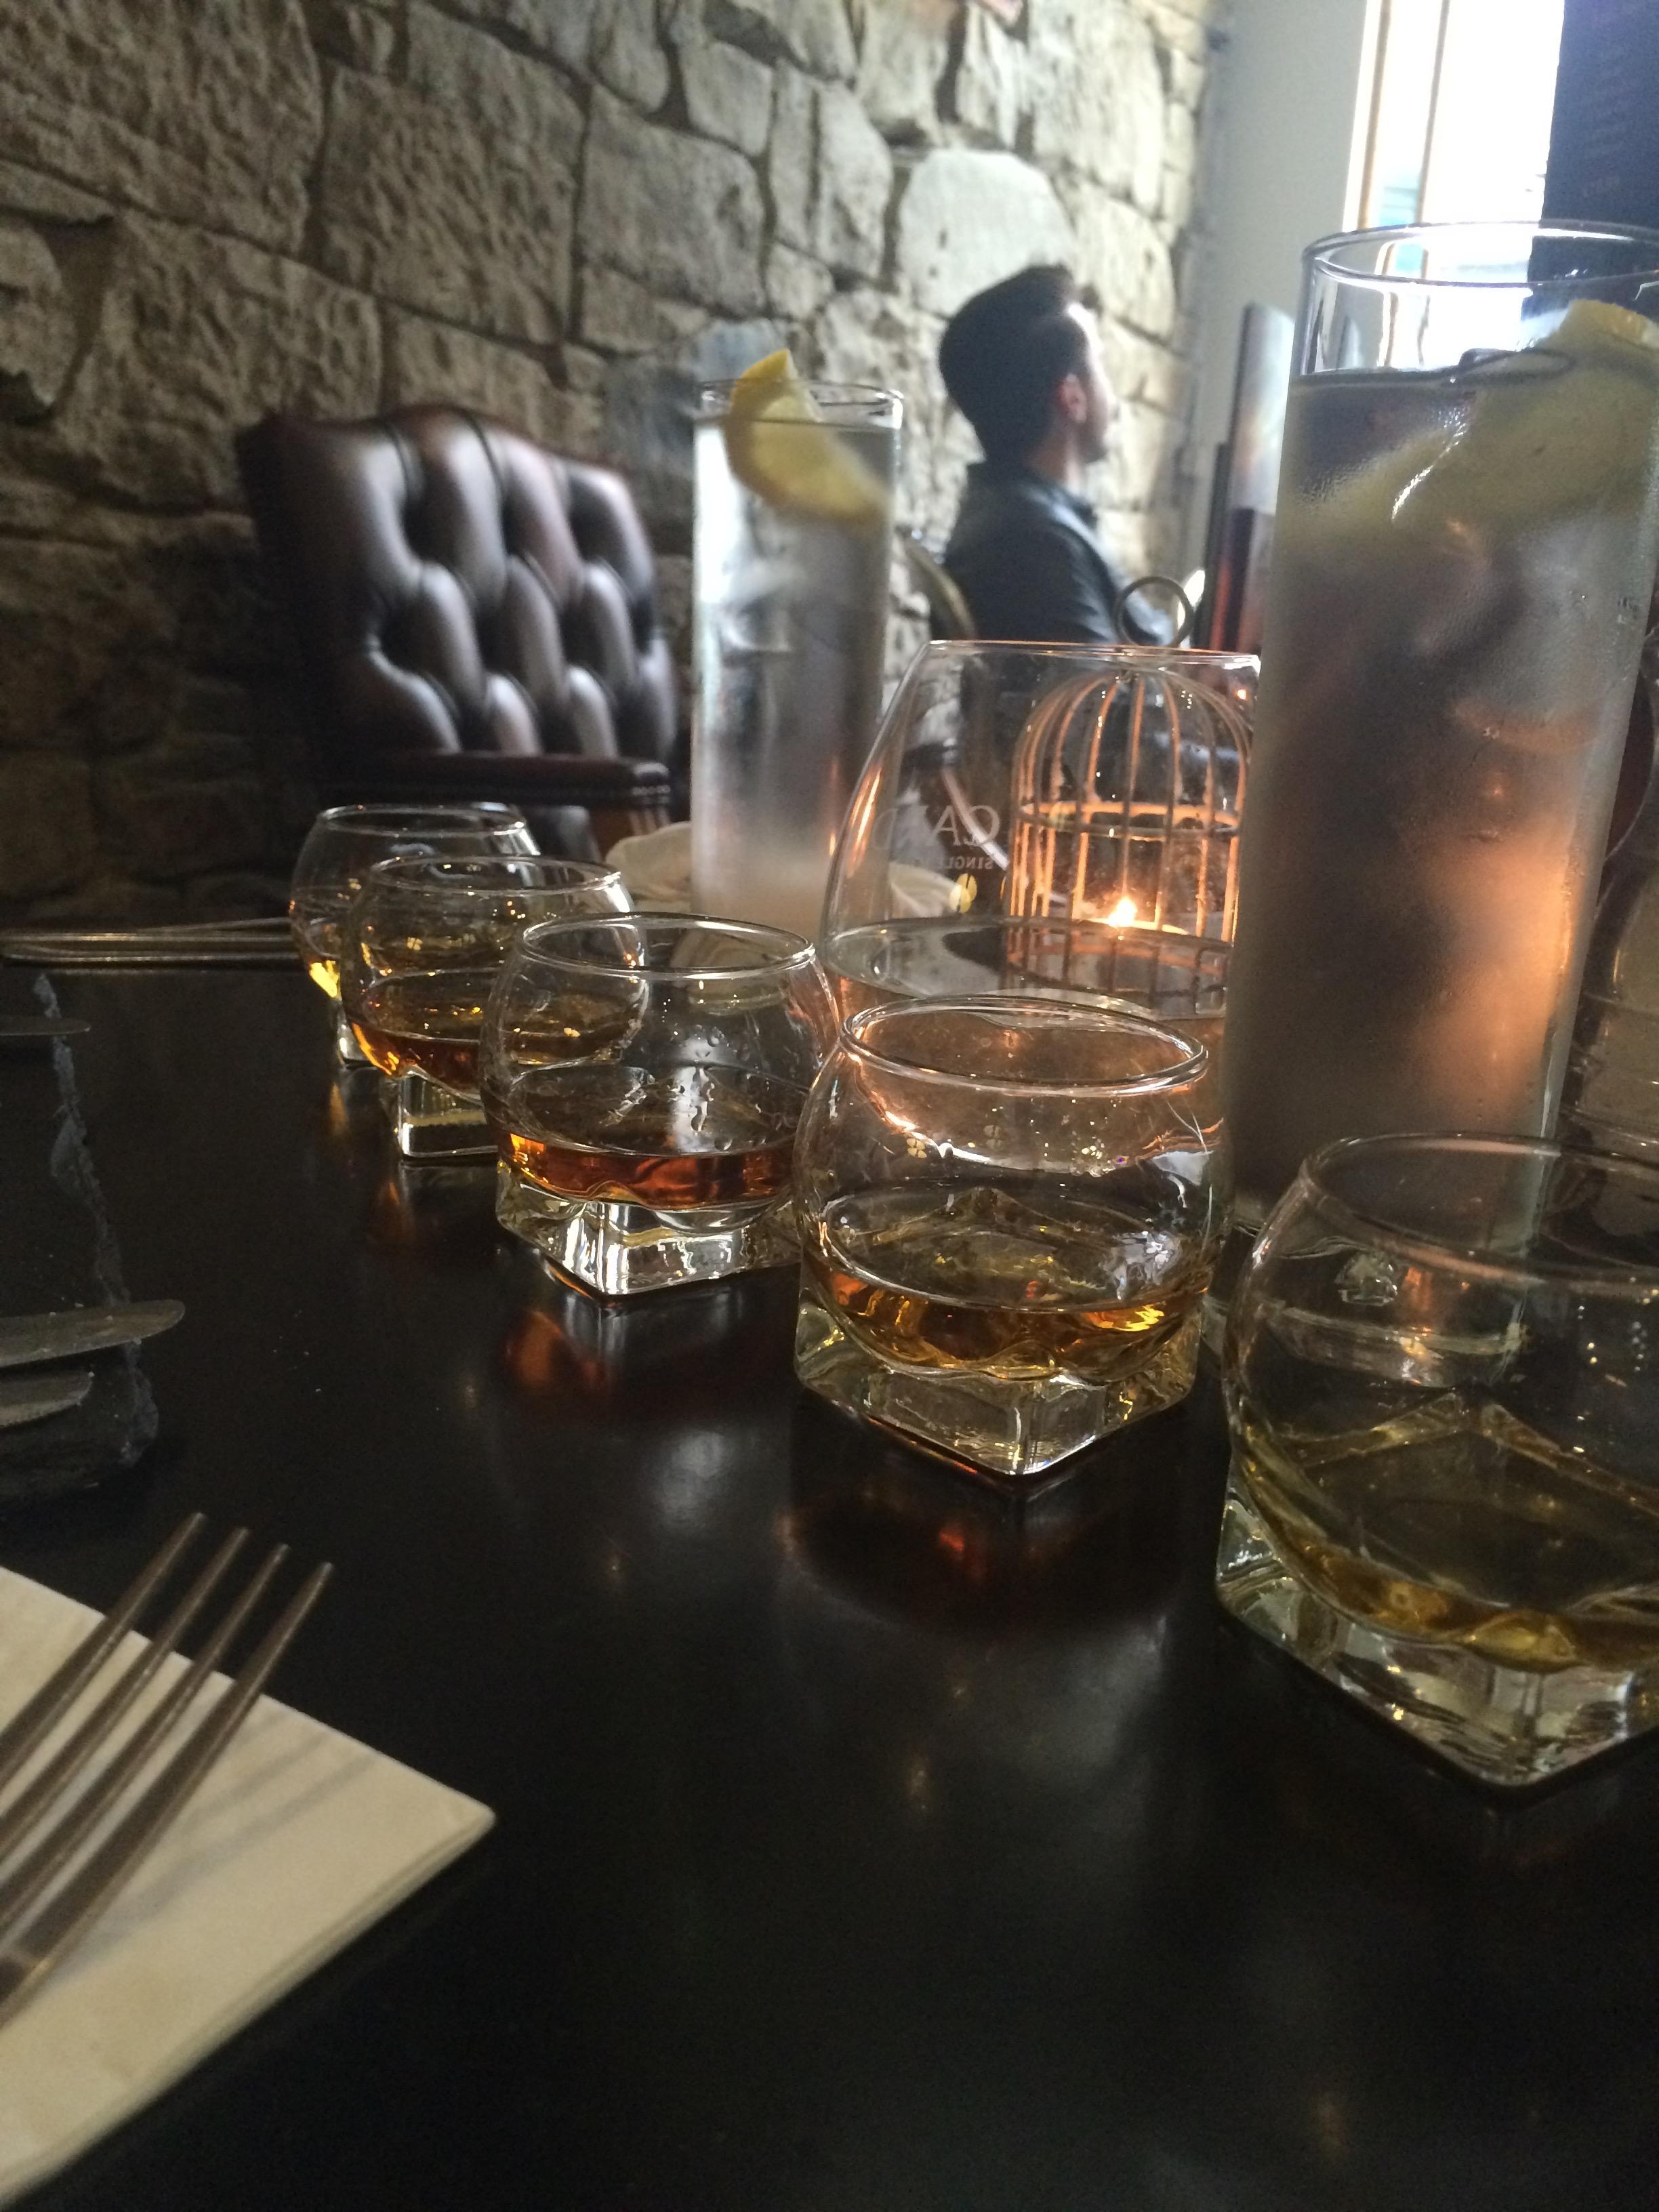 Edinburgh. Special mention for posh whisky.